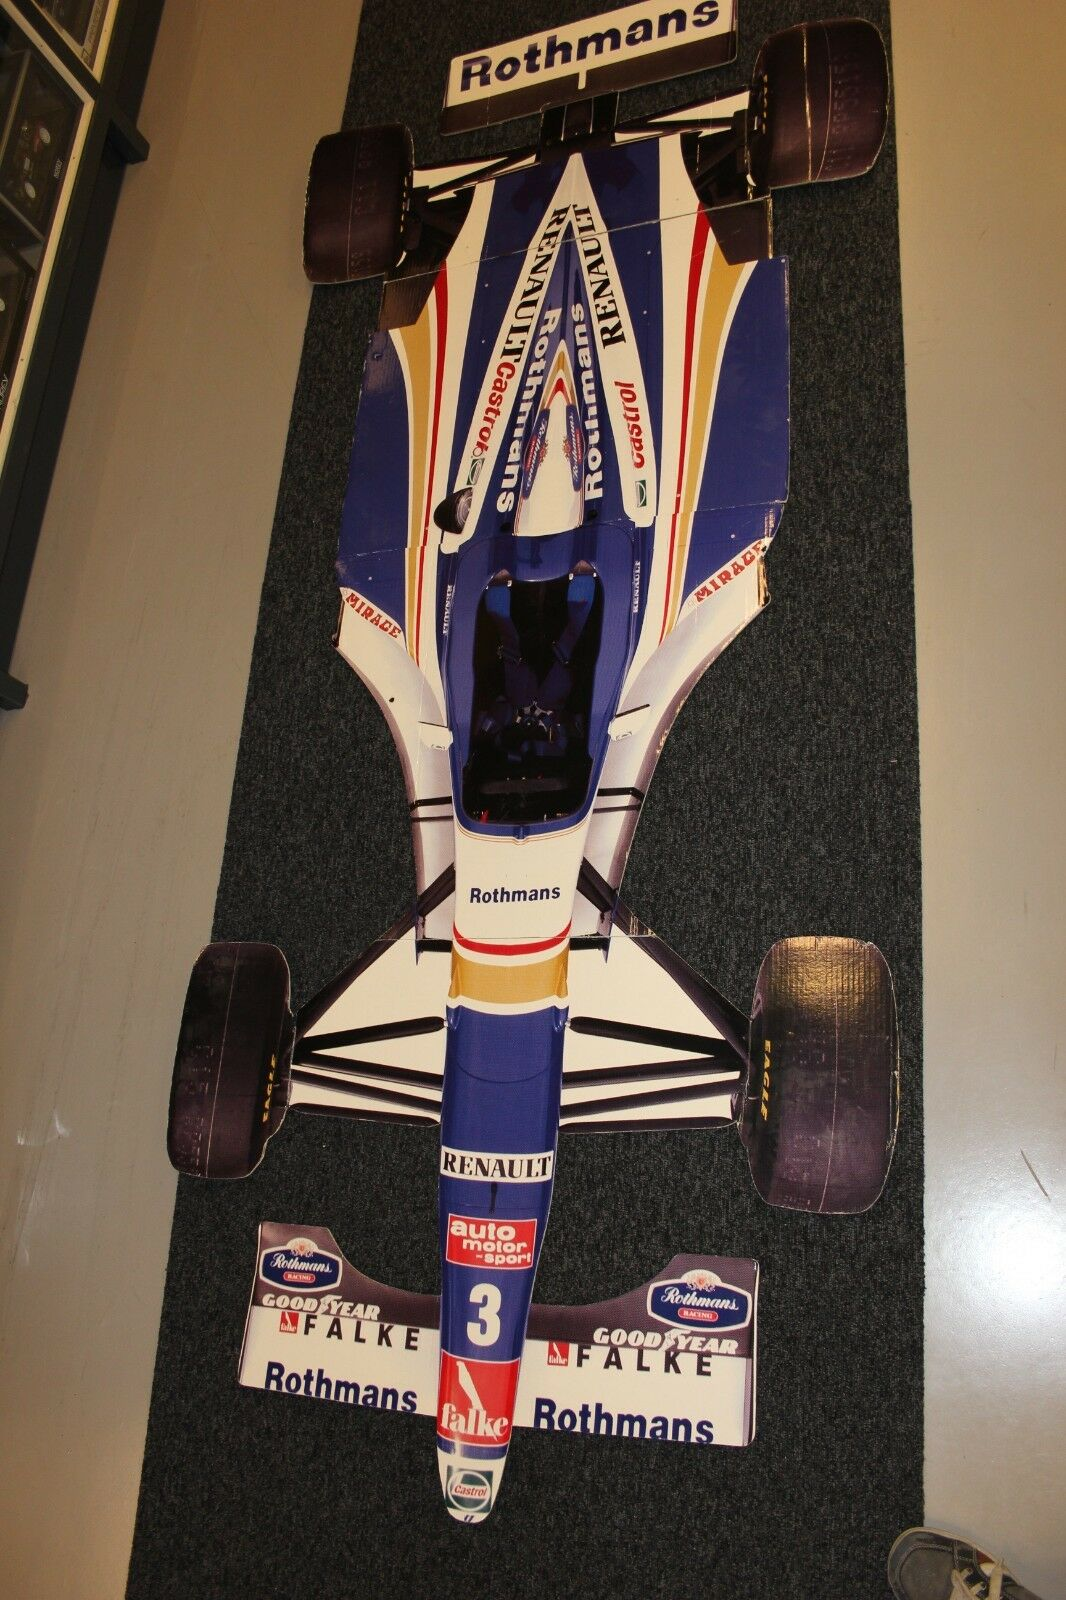 Cardboard model rougehmans Williams Renault FW19 1997  3 Villeneuve (235 cm )